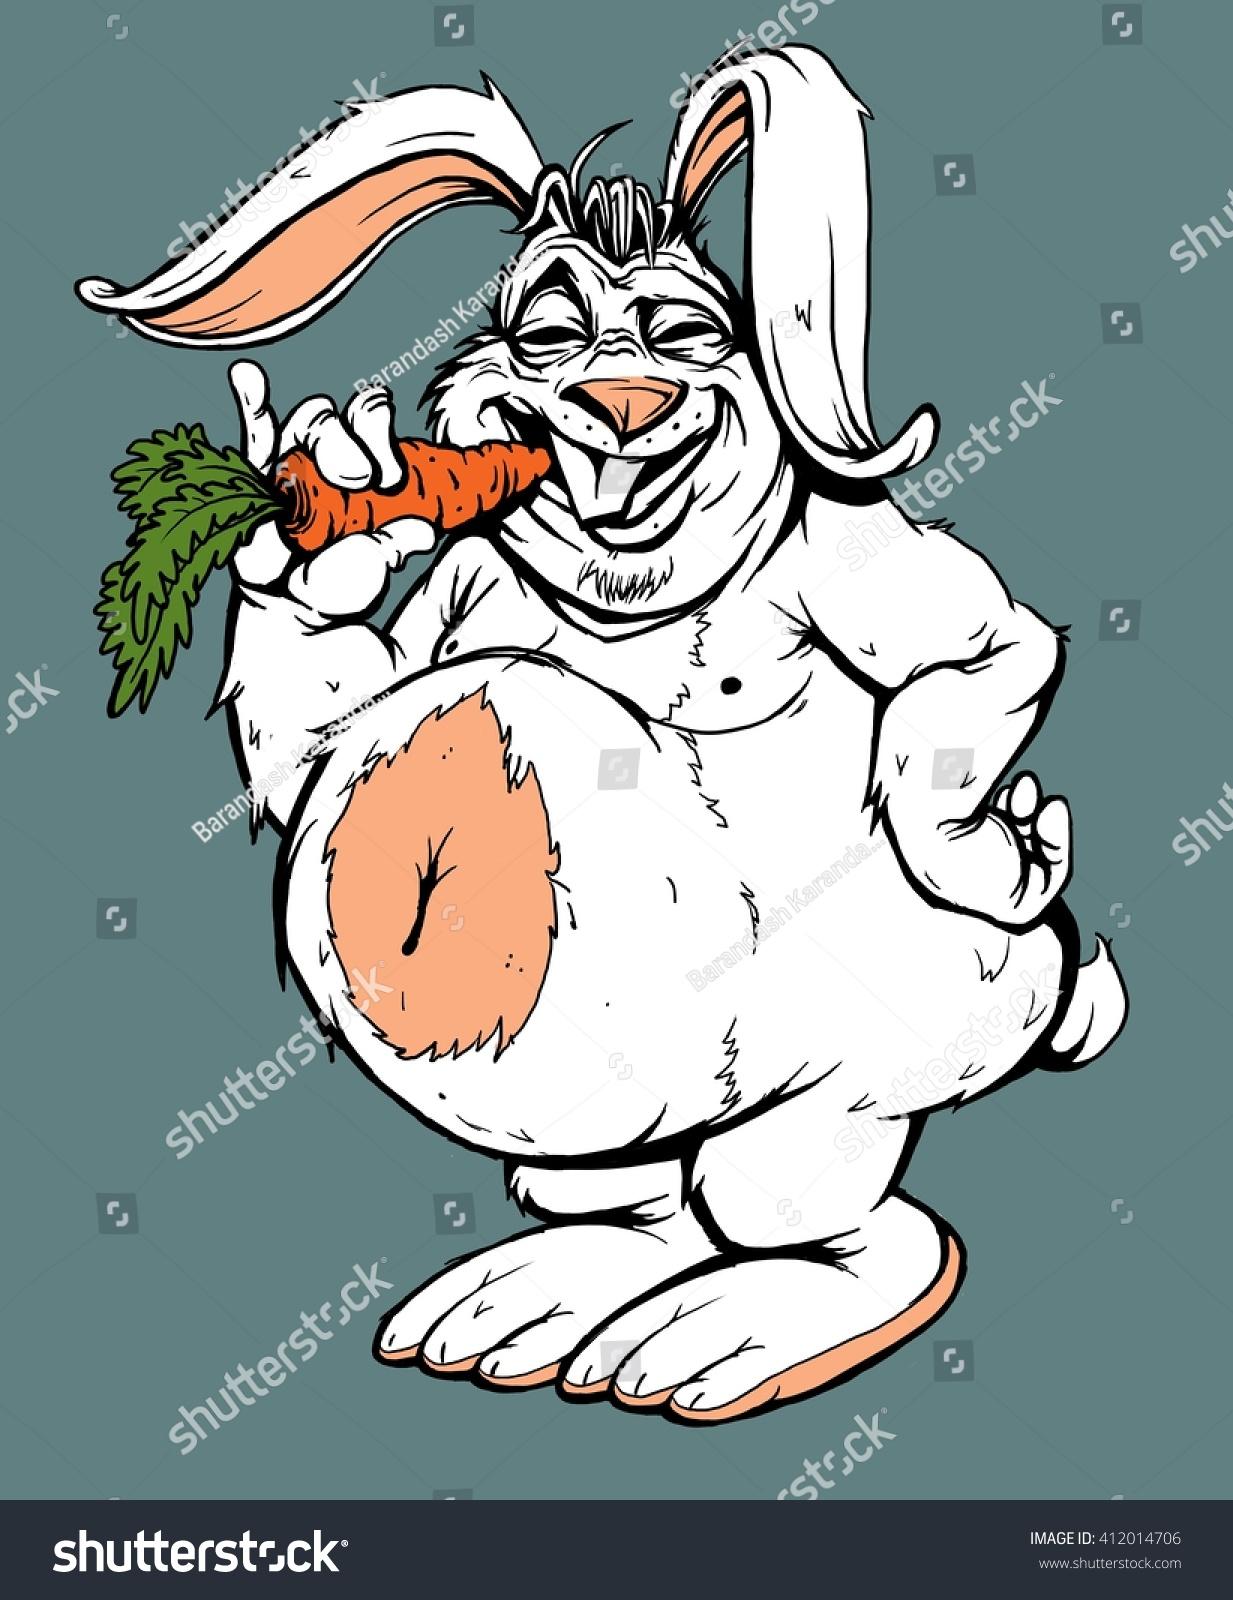 Royalty Free Stock Illustration Of Funny Fat Rabbit Carrot Cartoon